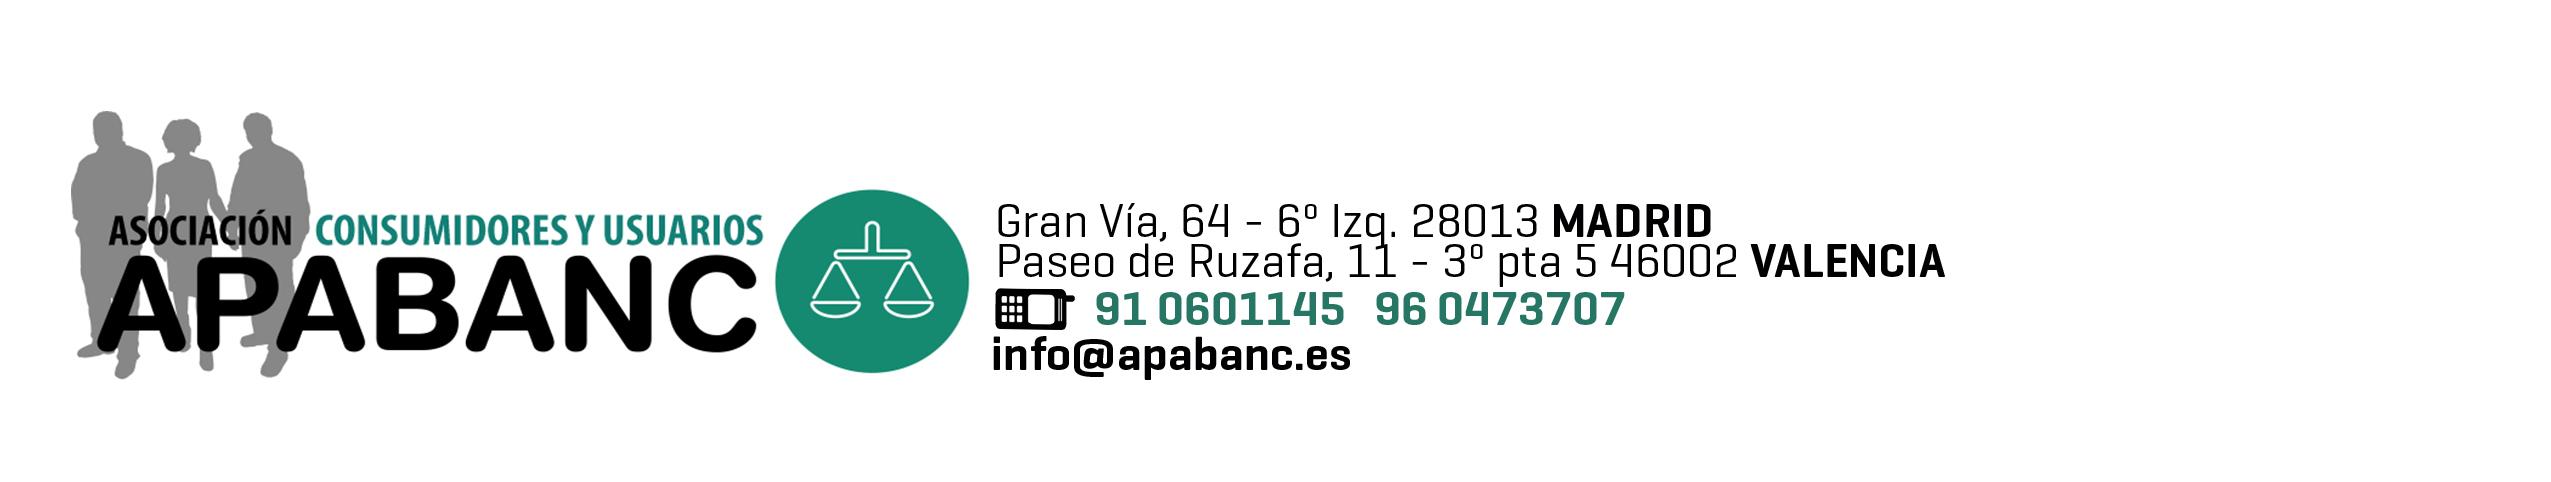 APABANC